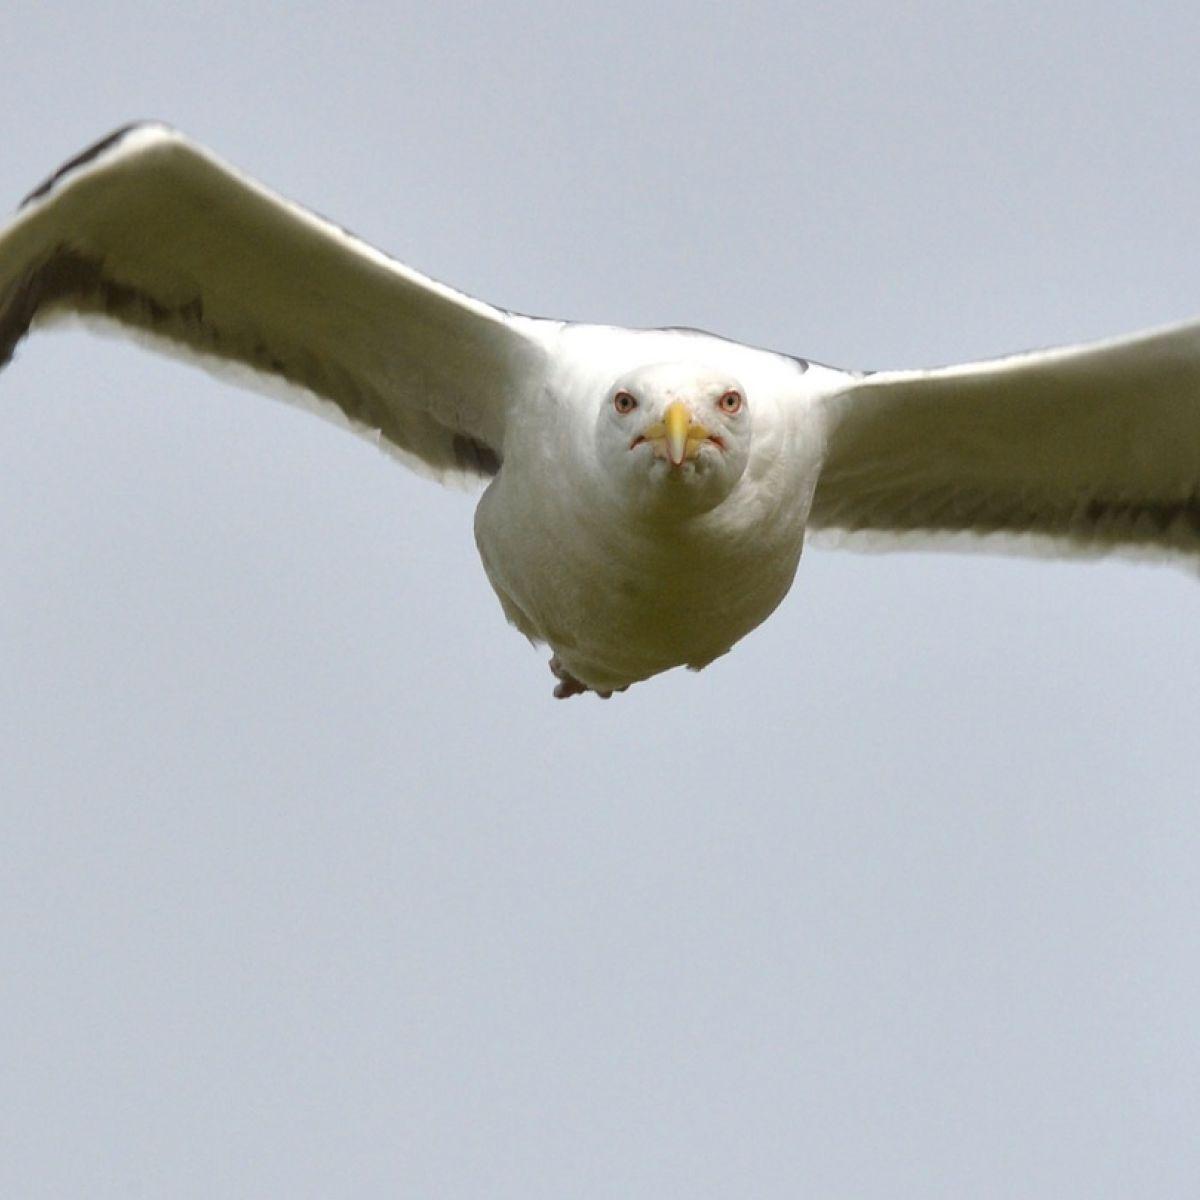 Aggressive seagulls are attacking Dubliners, Seanad told